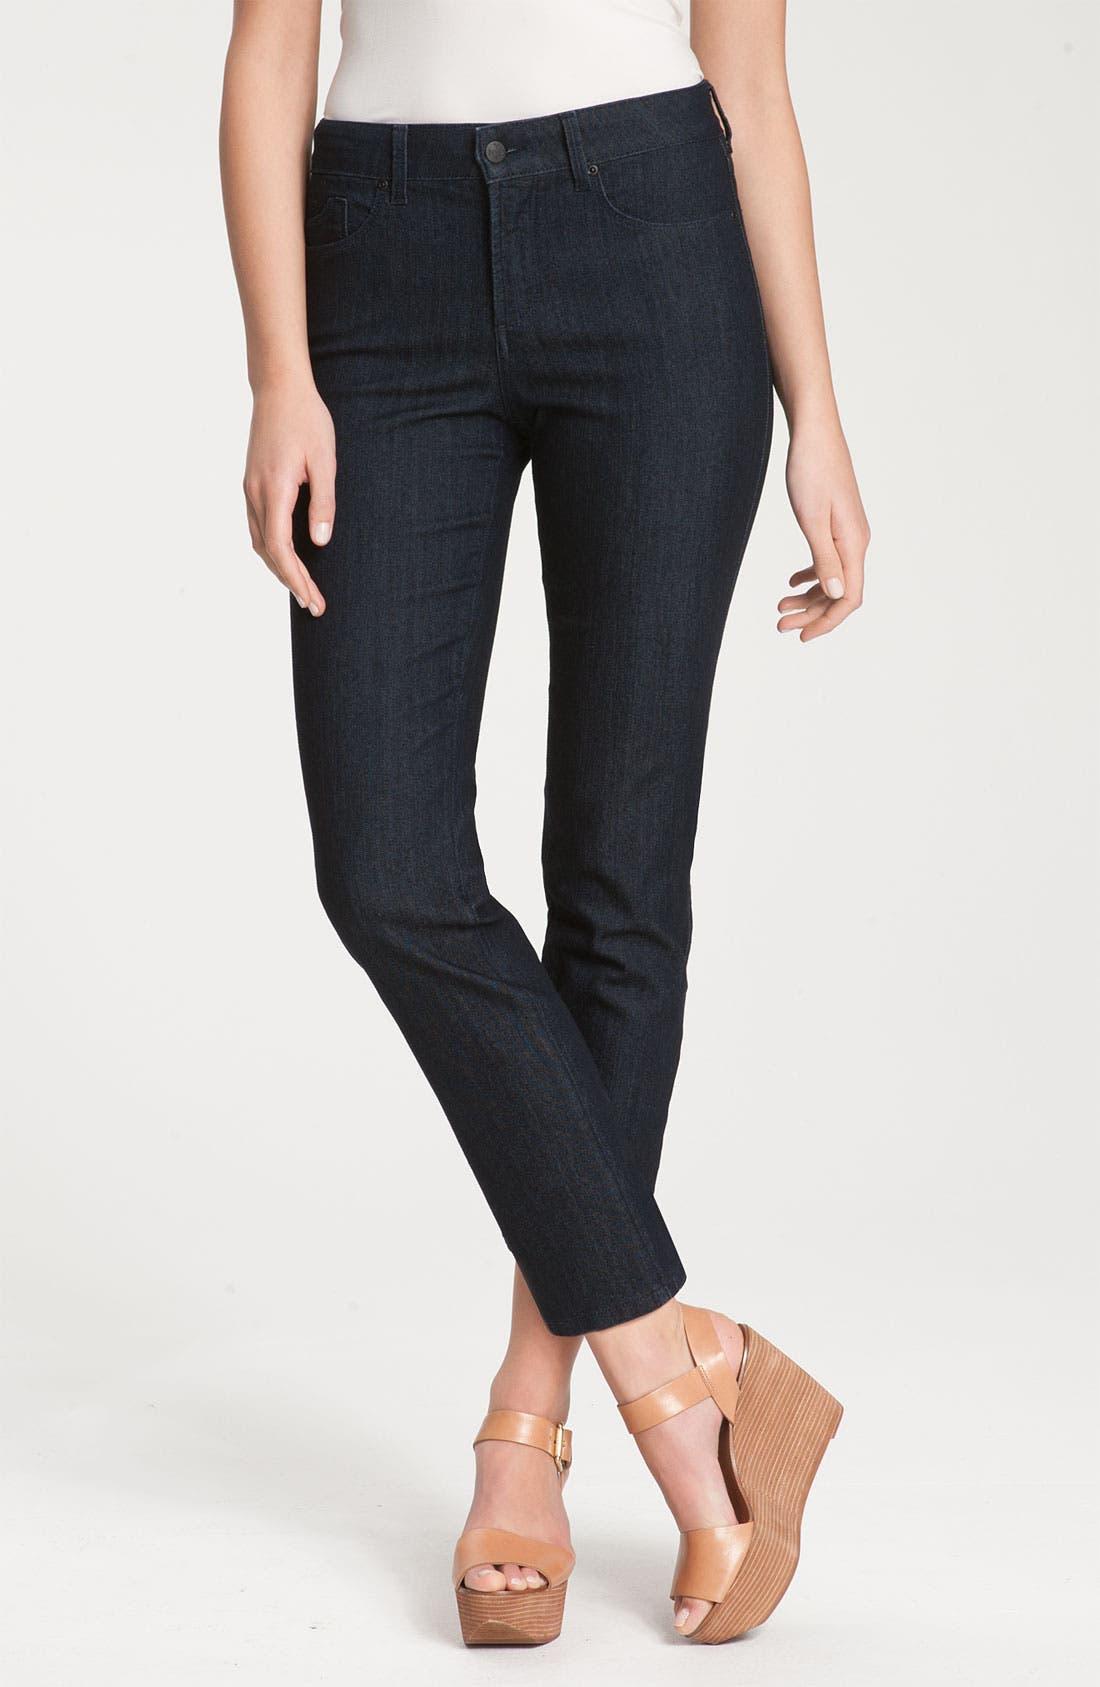 Alternate Image 1 Selected - NYDJ 'Alisha' Skinny Stretch Jeans